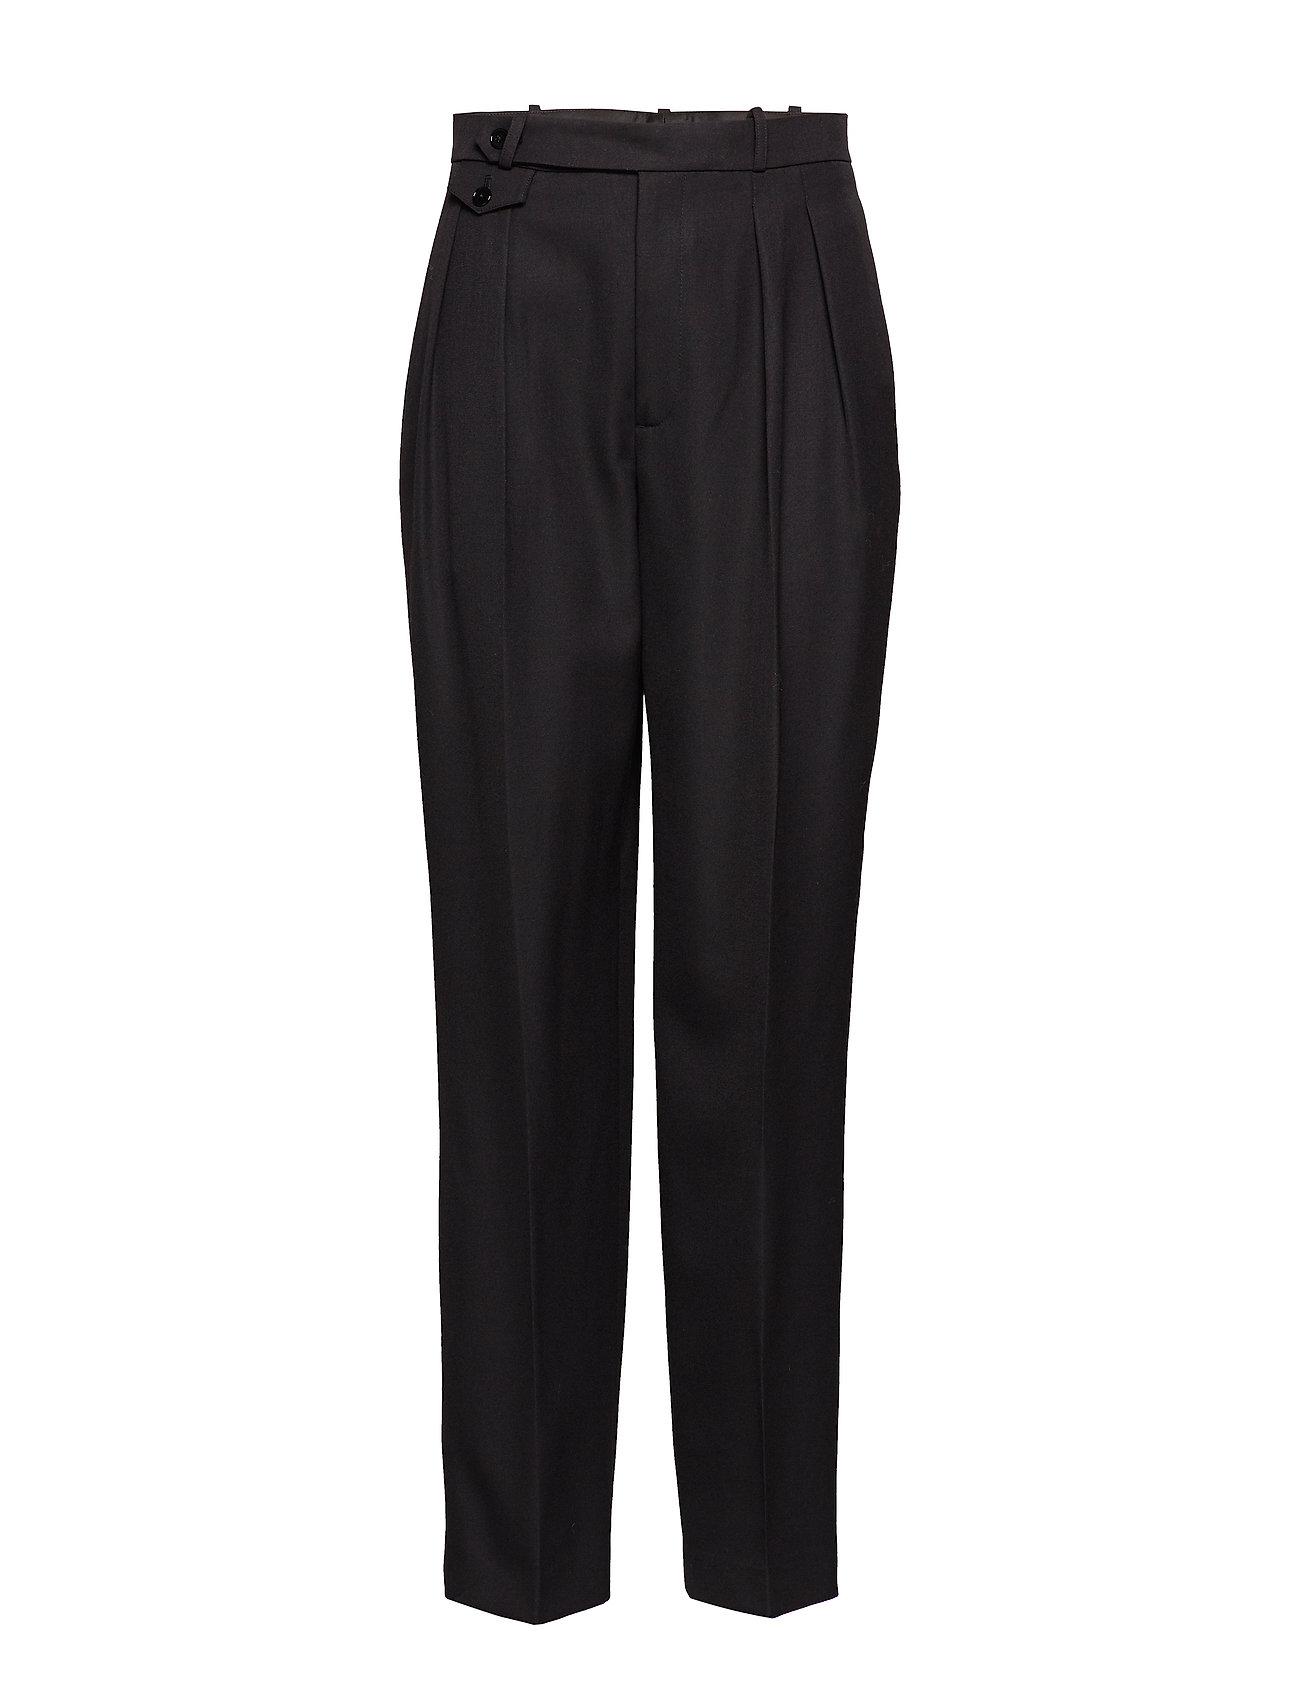 8f8db2bda7e Tuxedo-stripe Wool Pant (Polo Black) (£279) - Polo Ralph Lauren ...